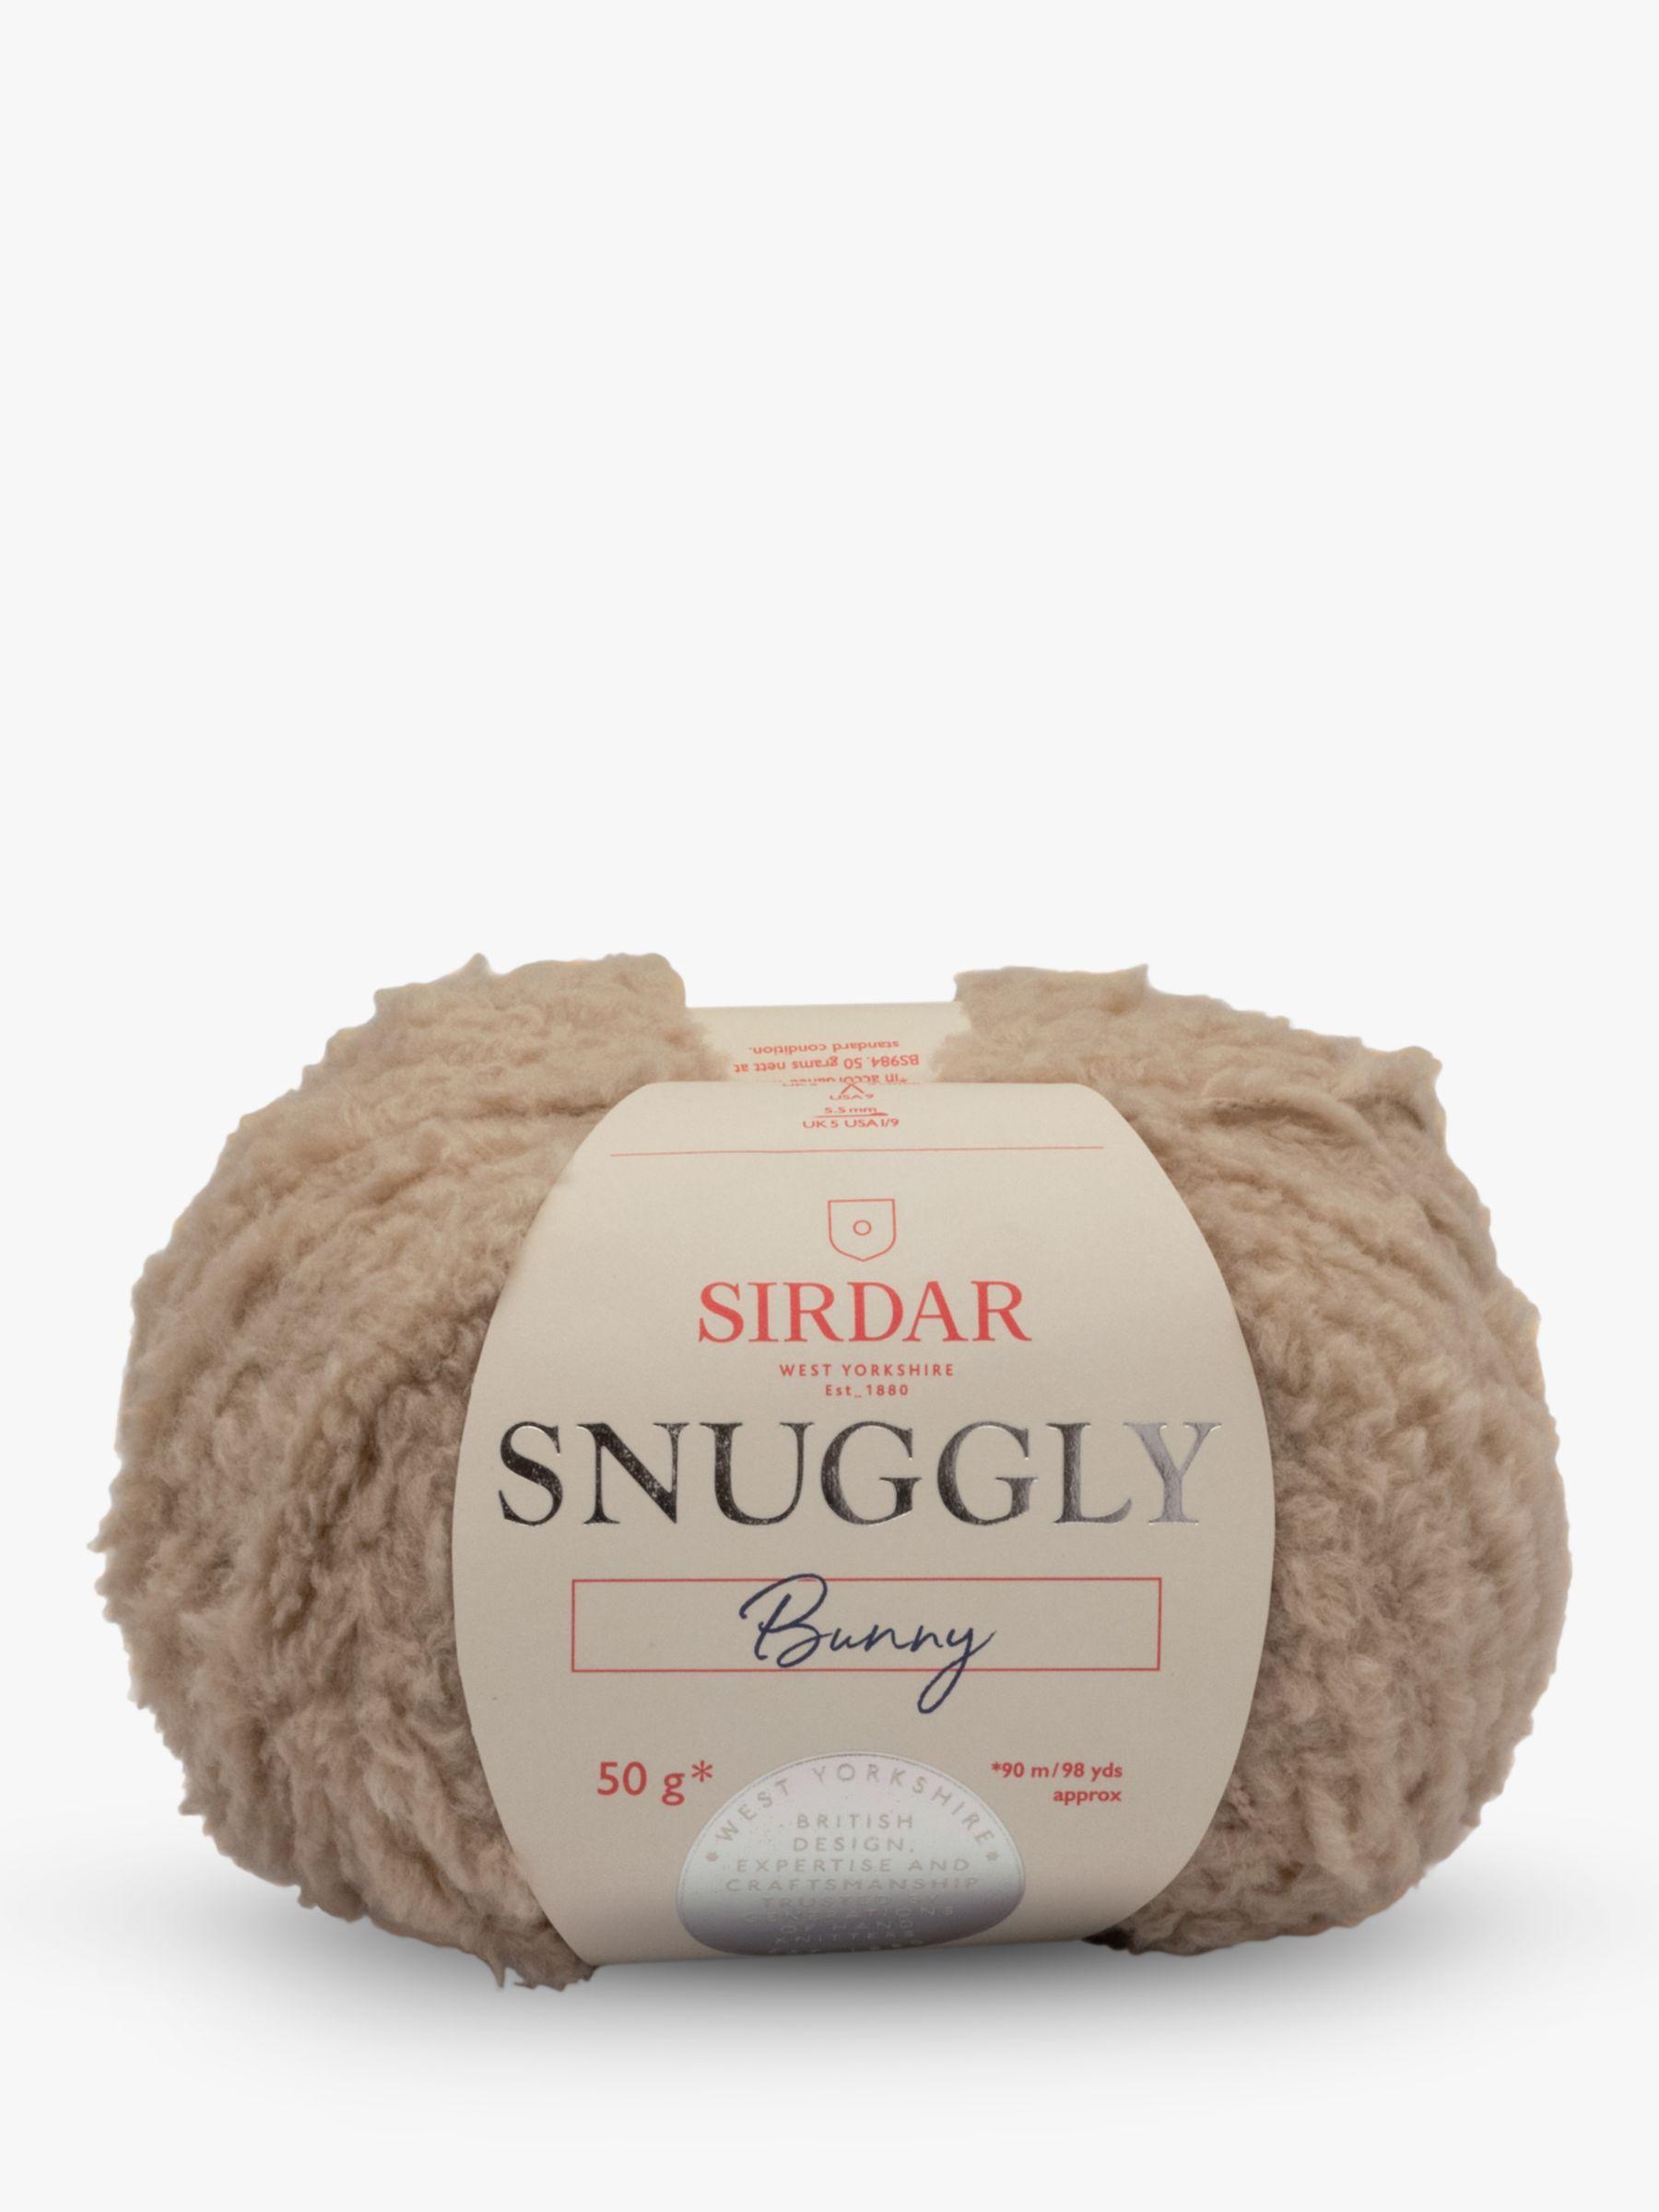 Sirdar Sirdar Snuggly Bunny DK Yarn, 50g